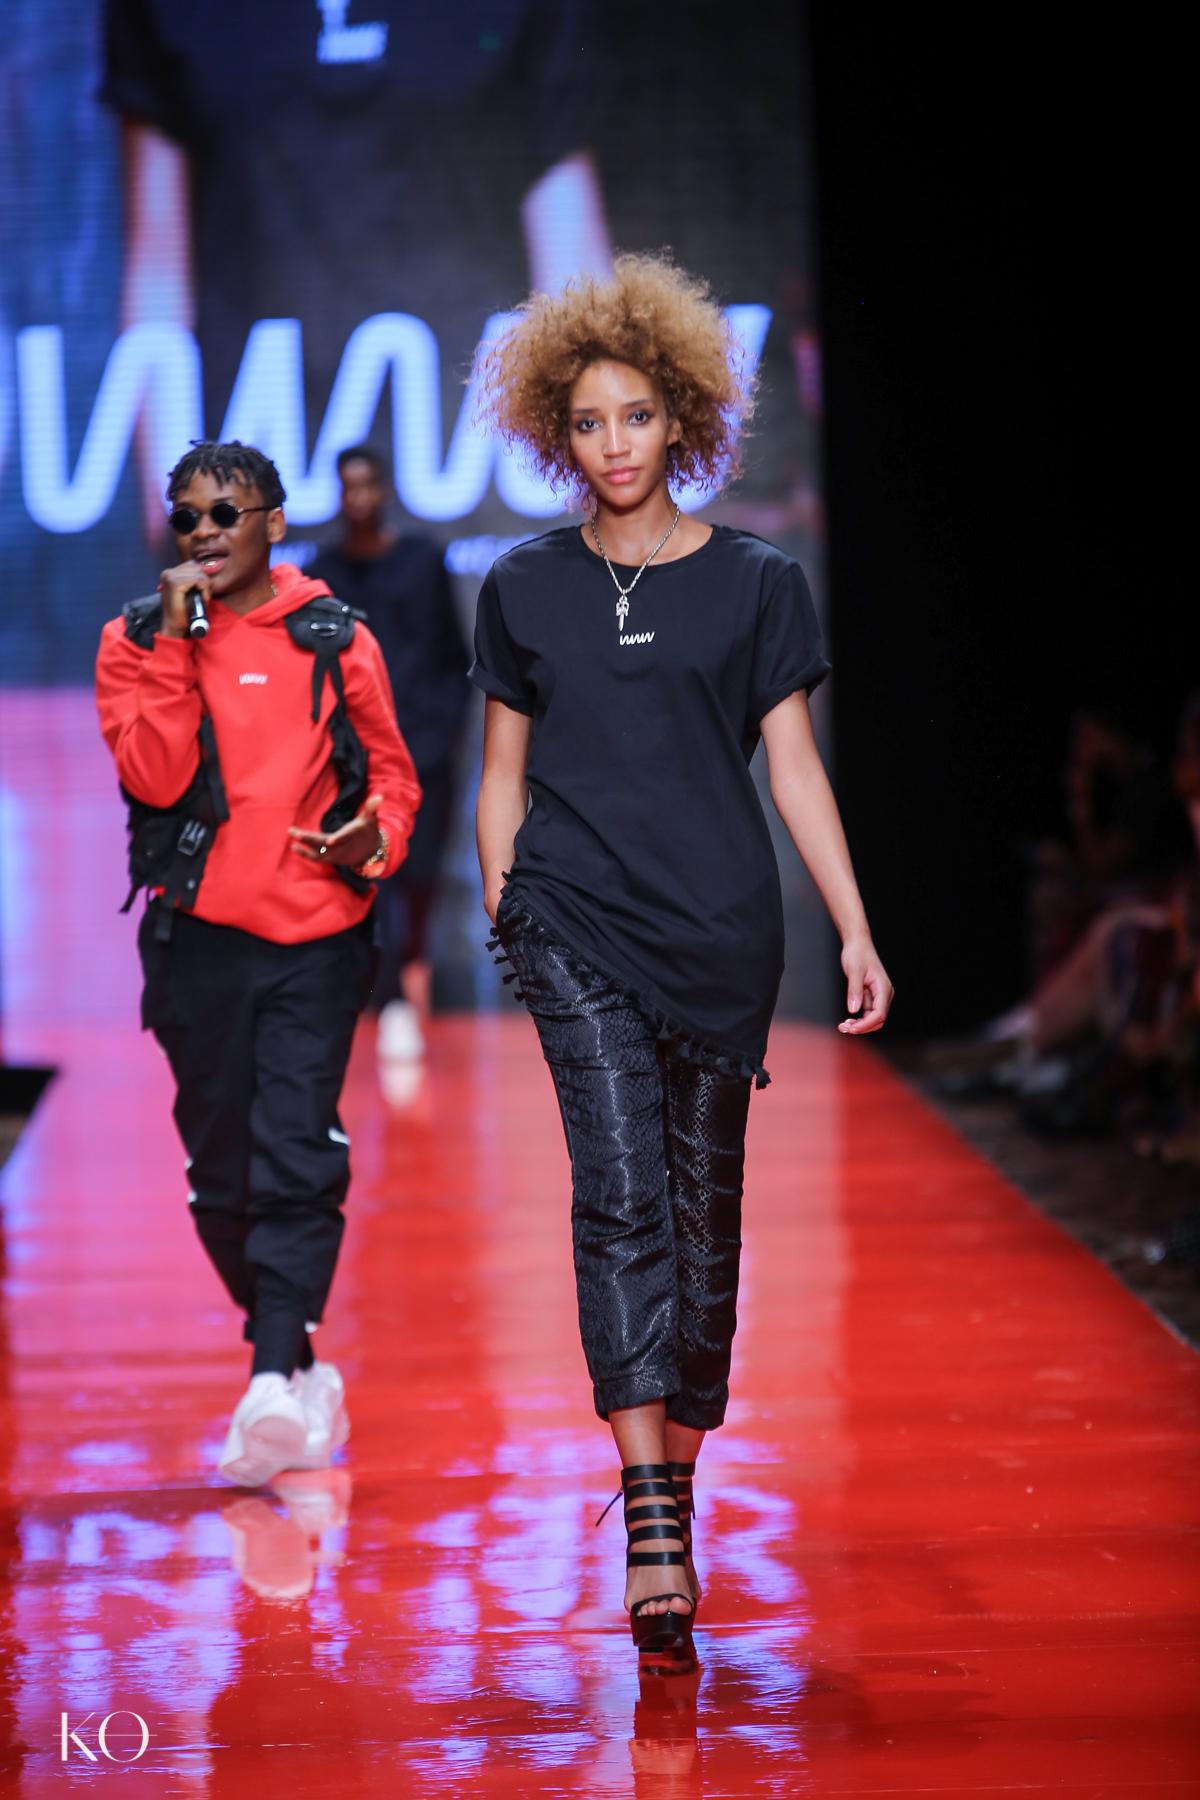 ARISE Fashion Week 2018 | What We Wear